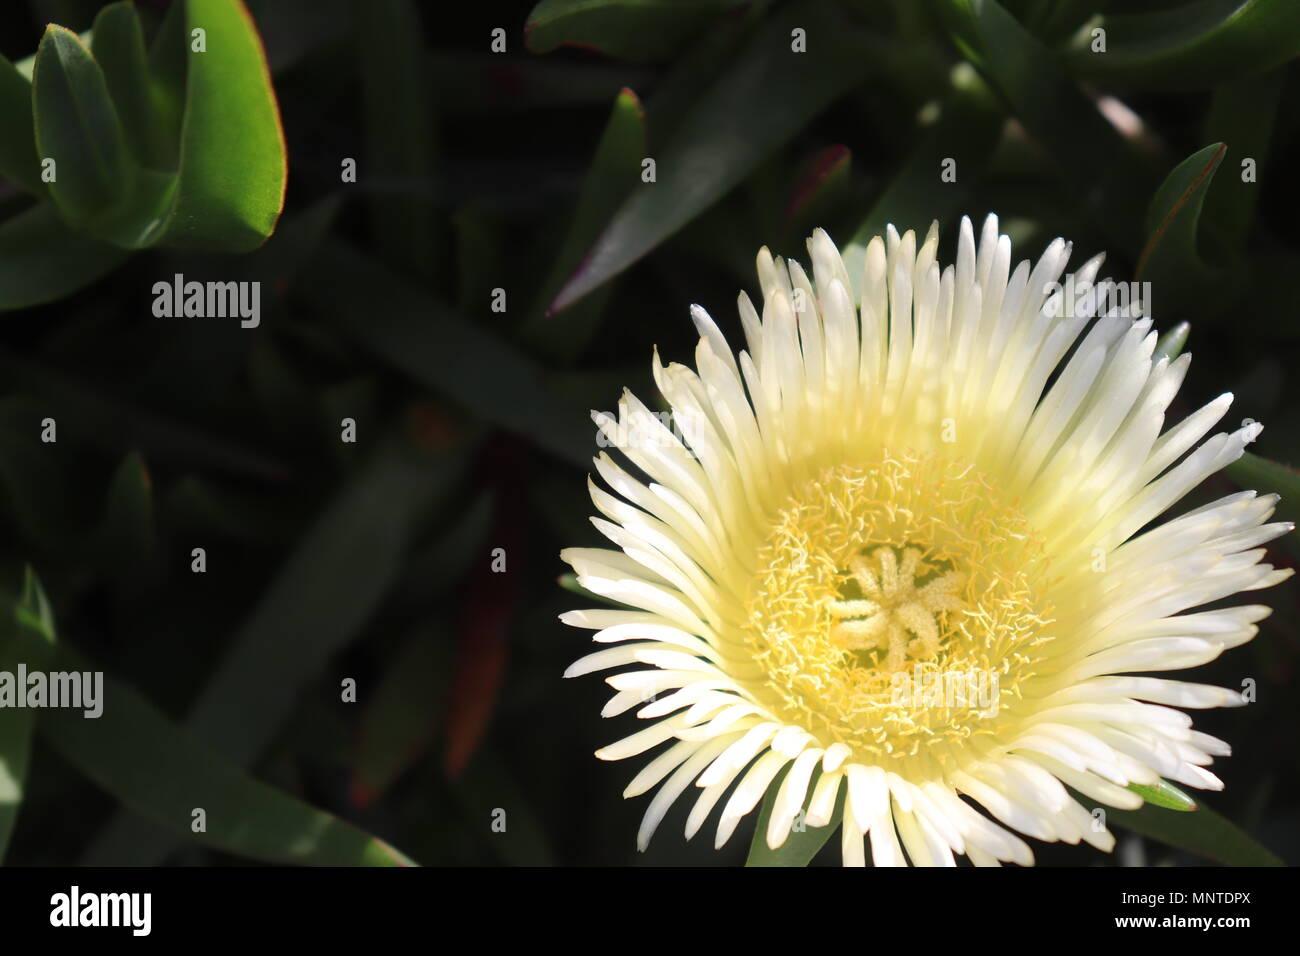 Wild Flower Dahlia In White Color Stock Photo 185549138 Alamy